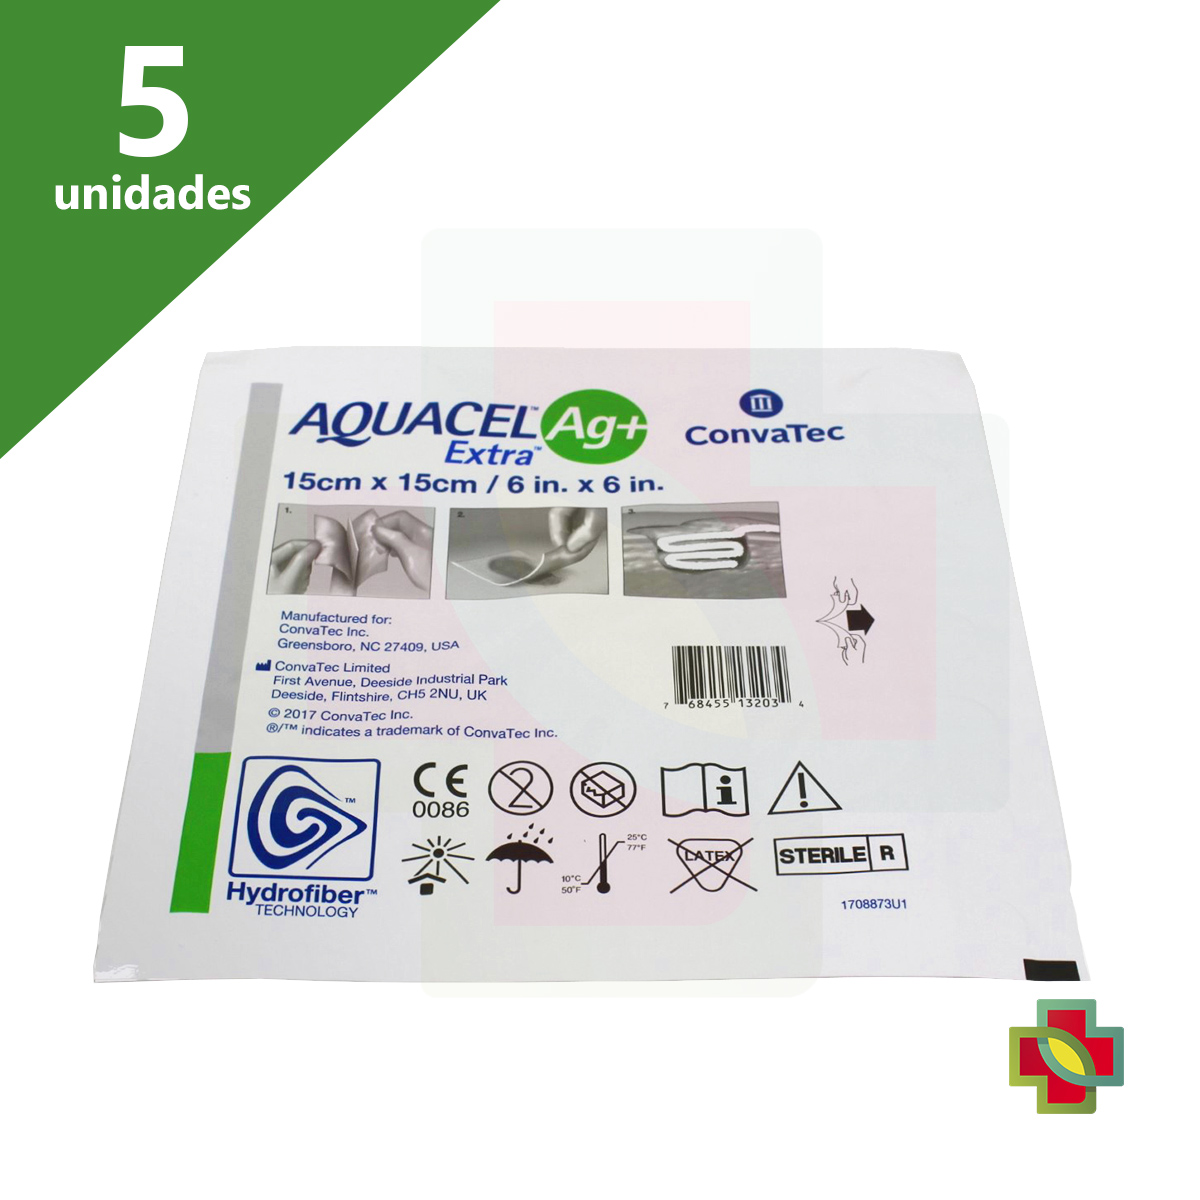 CURATIVO AQUACEL EXTRA AG+ 15 X 15 BR10378 (KIT C/ 5 UNDS)